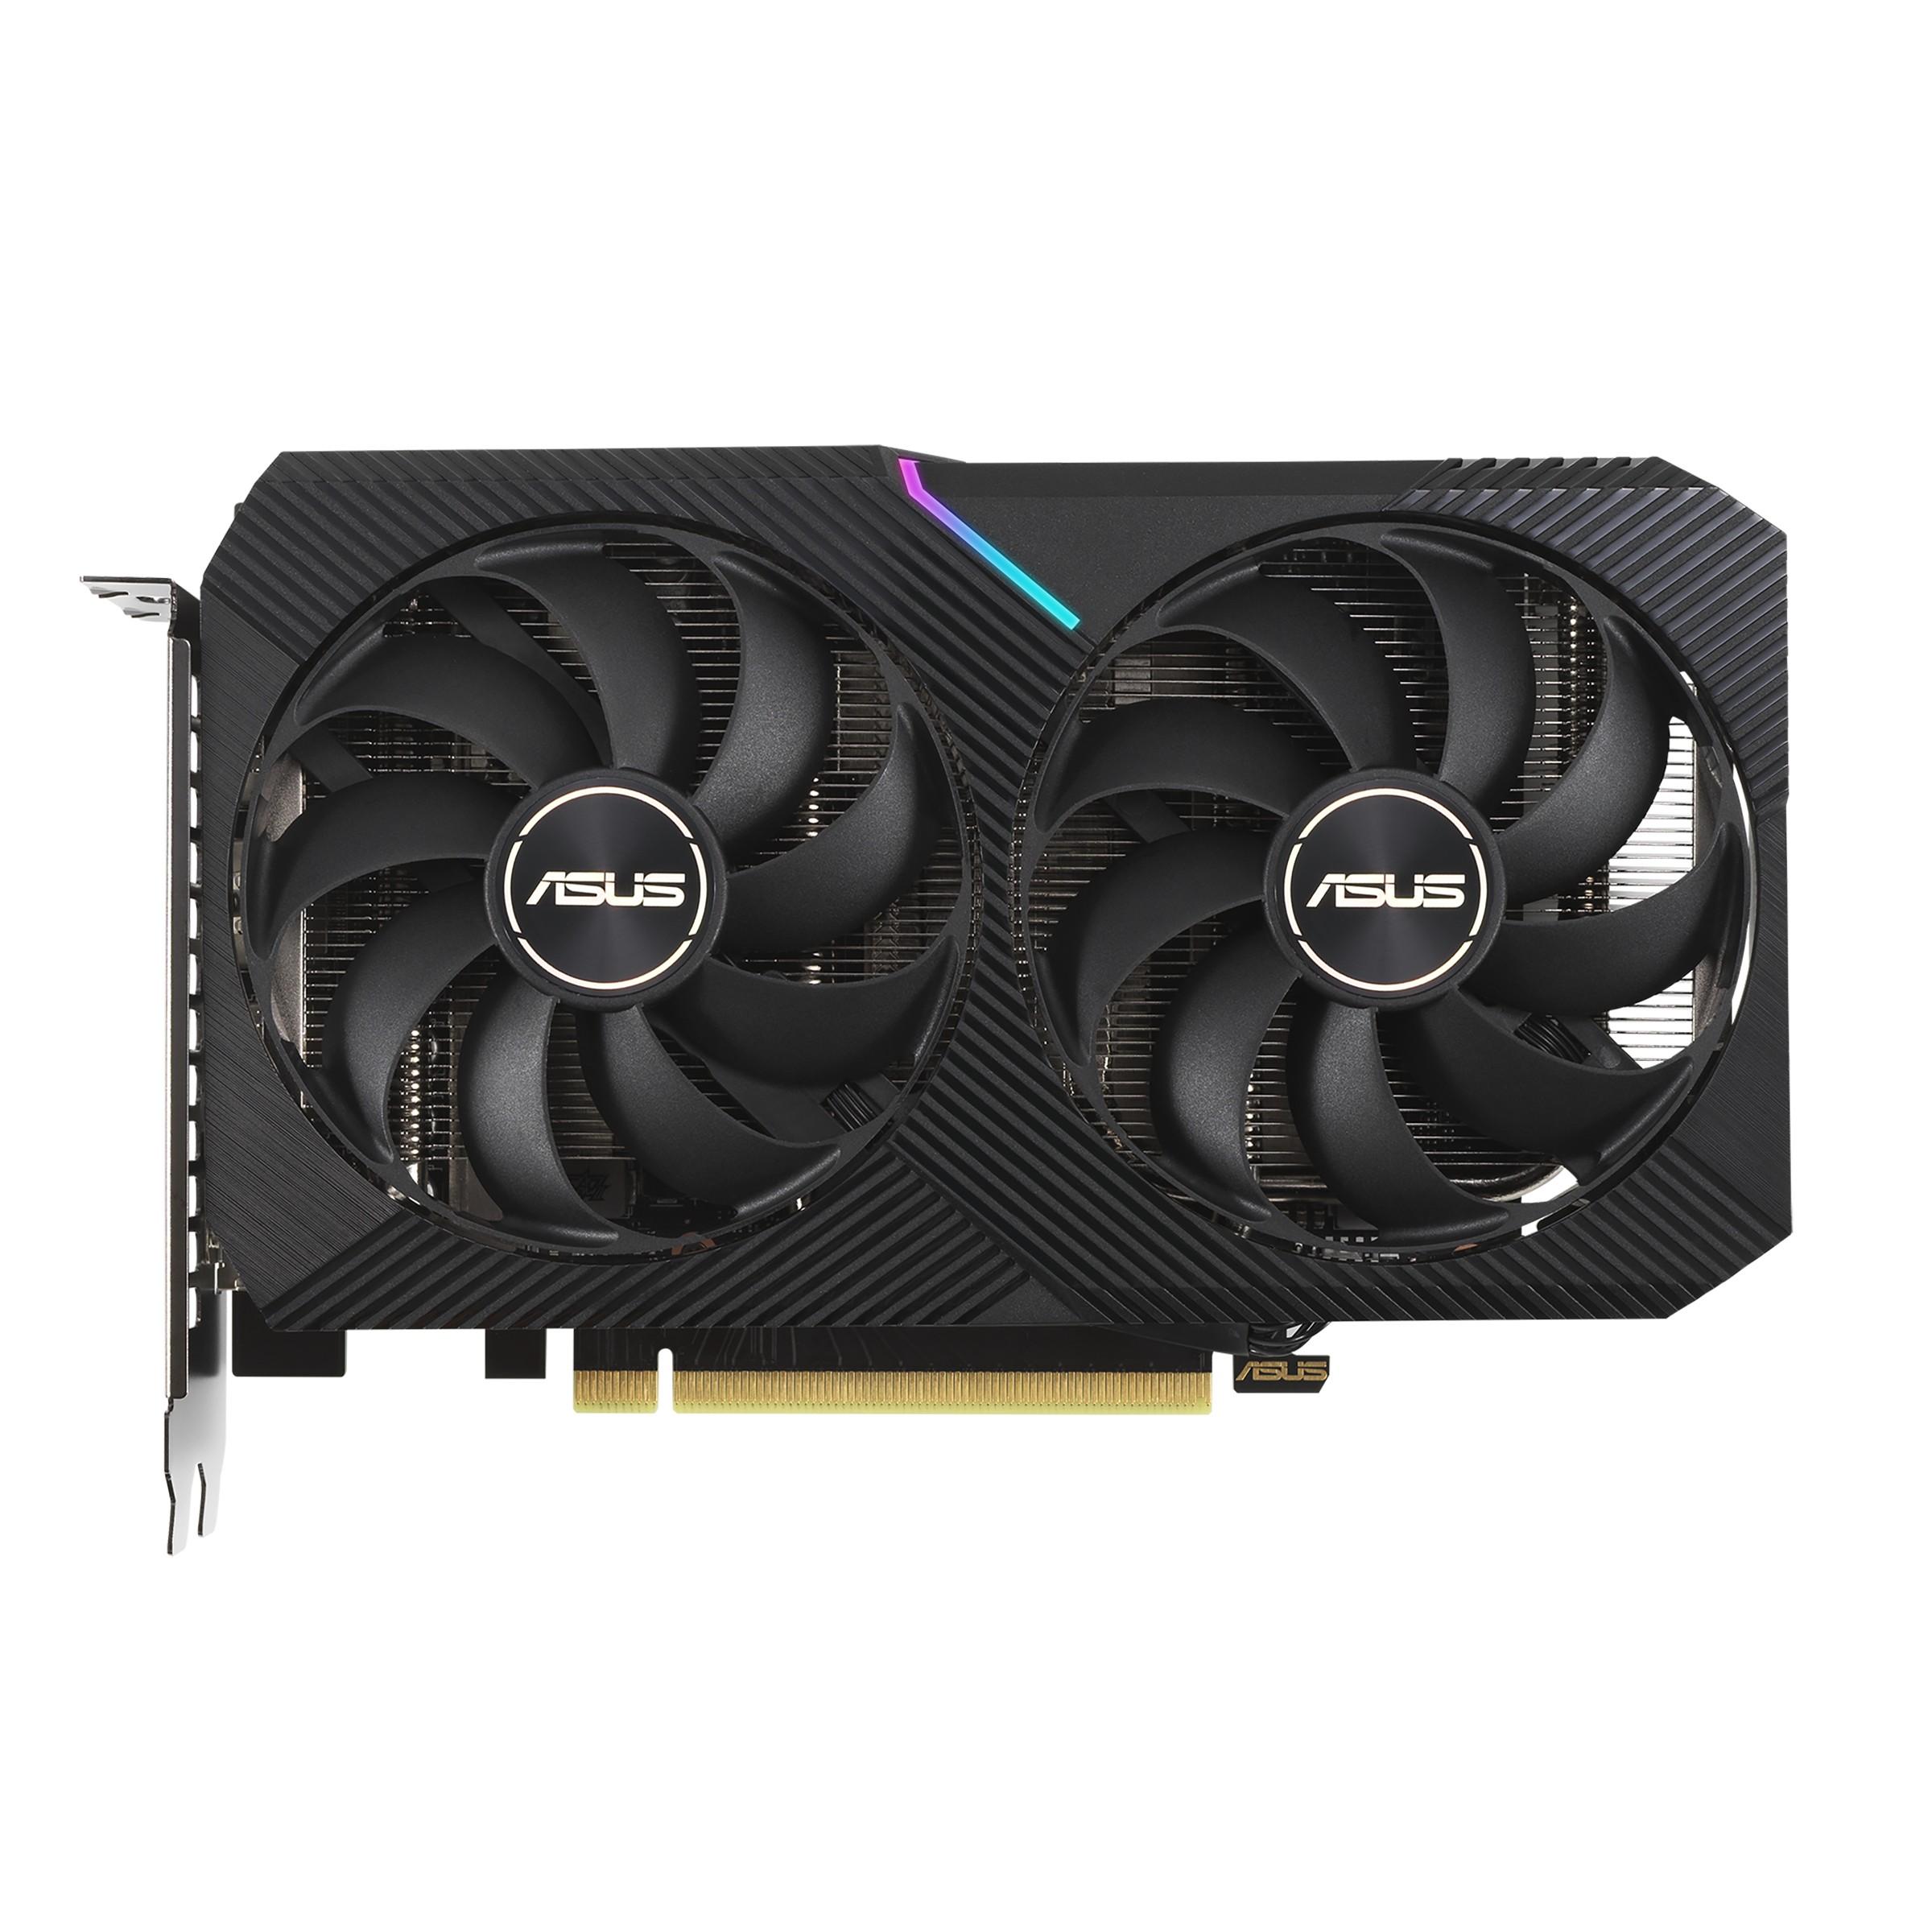 ASUS Dual -RTX3060-O12G-V2 NVIDIA GeForce RTX 3060 12 GB GDDR6